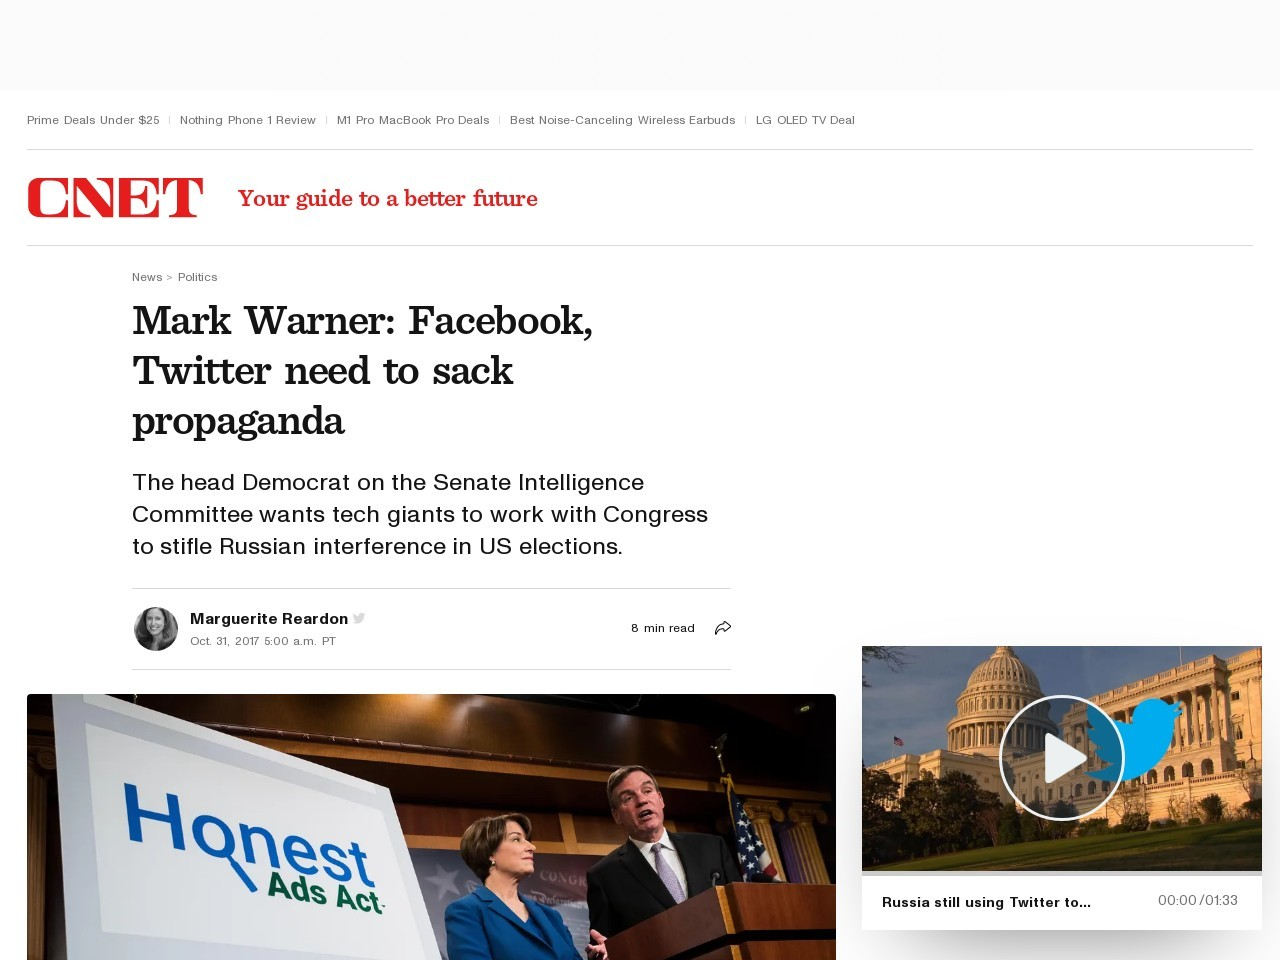 Mark Warner: Facebook, Twitter need to sack propaganda     – CNET